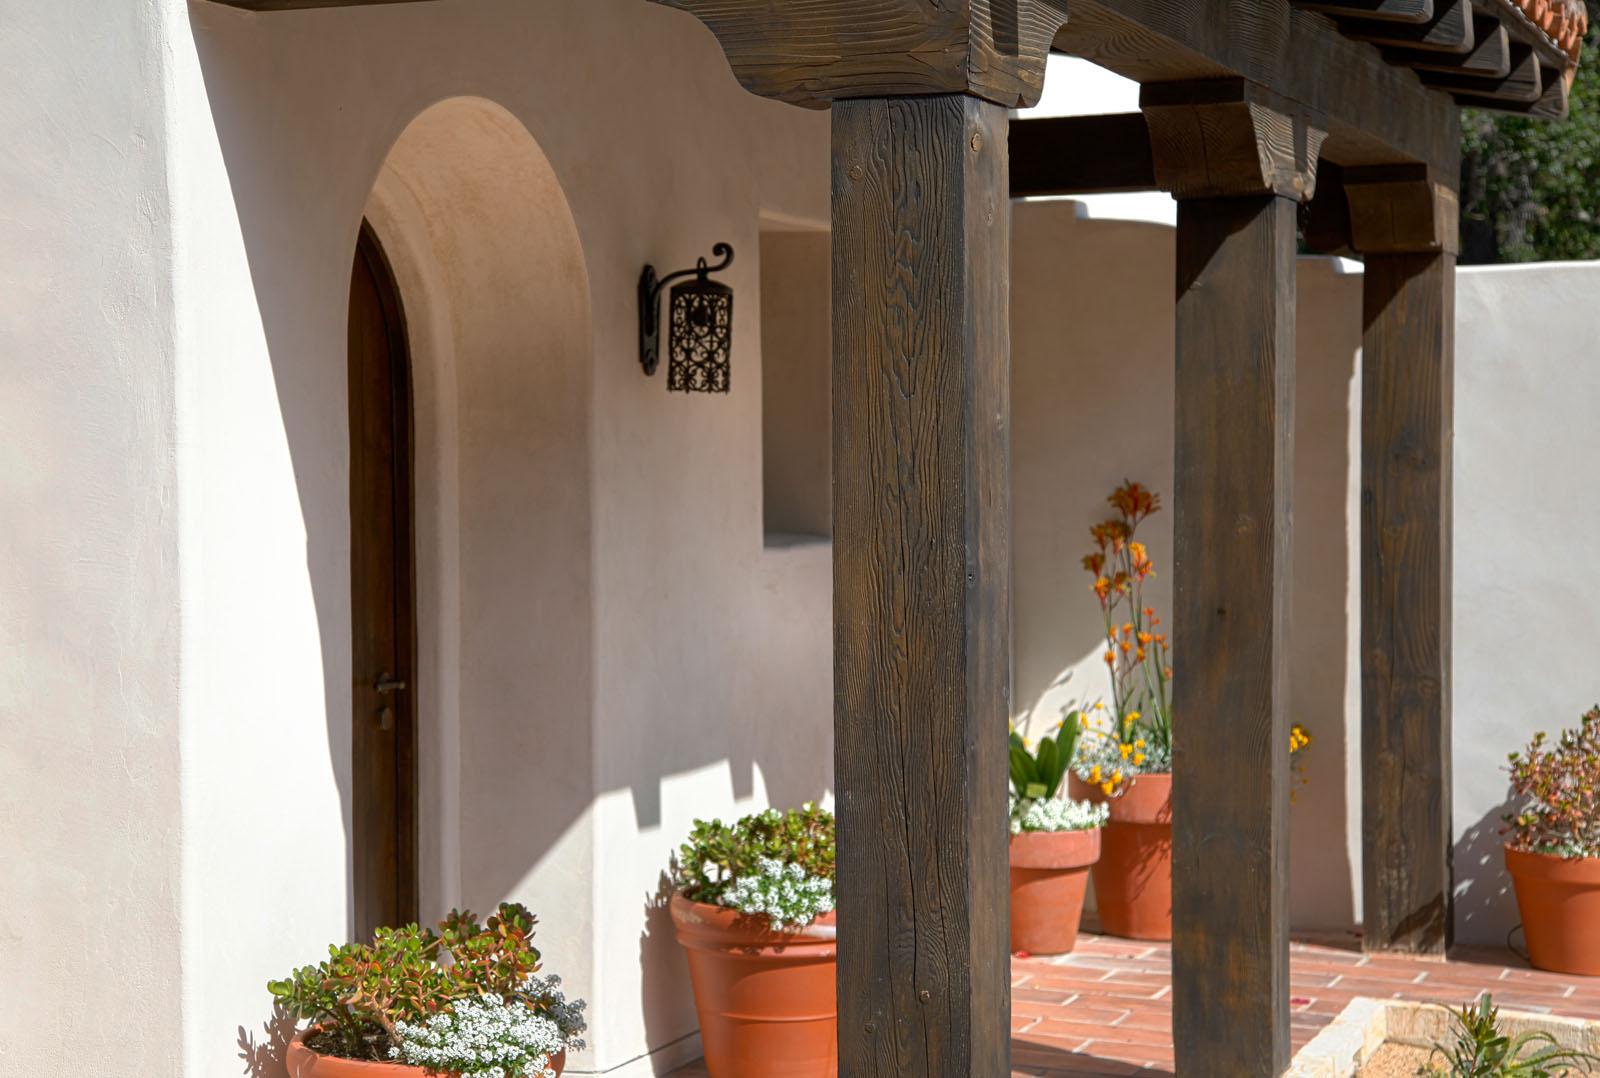 Bertelsen Residence 7 - Guest House Spanish Loggia with wood columns.jpg